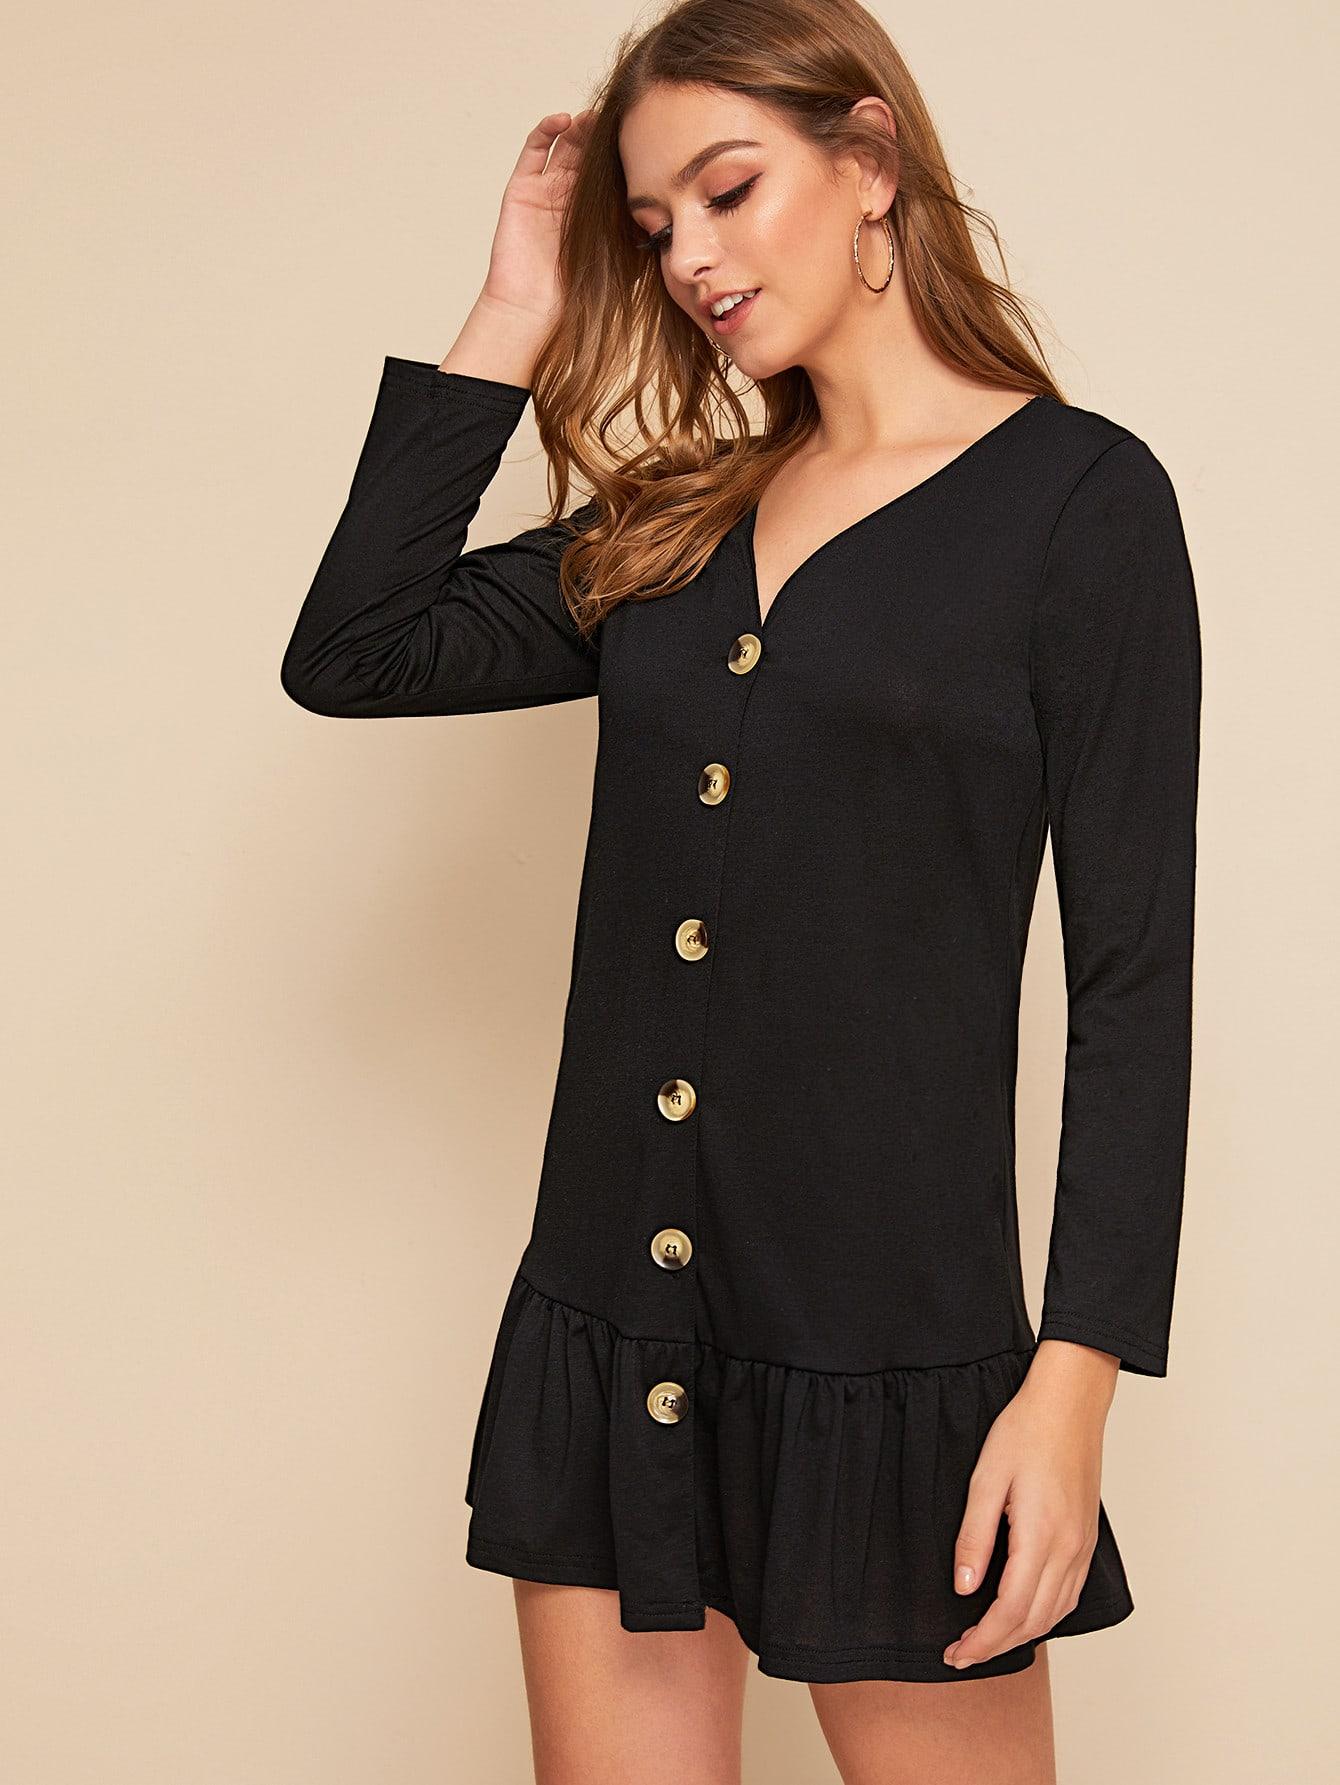 SHEIN / Vestido bajo fruncido con botón